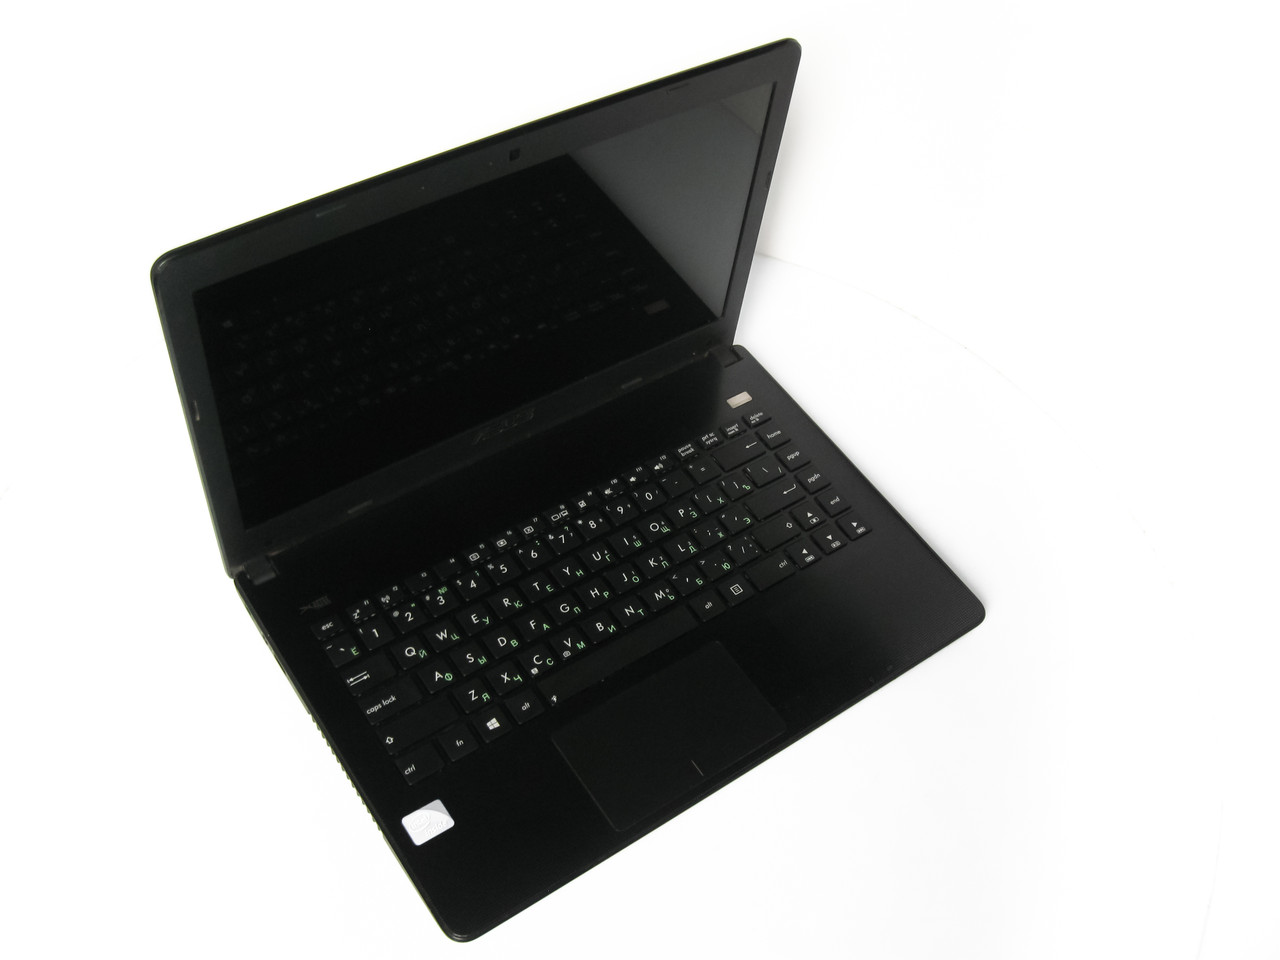 Ультрабук Asus X401A 14.0 (1366x768) / Intel Pentium B960 (2x2.2GHz) /